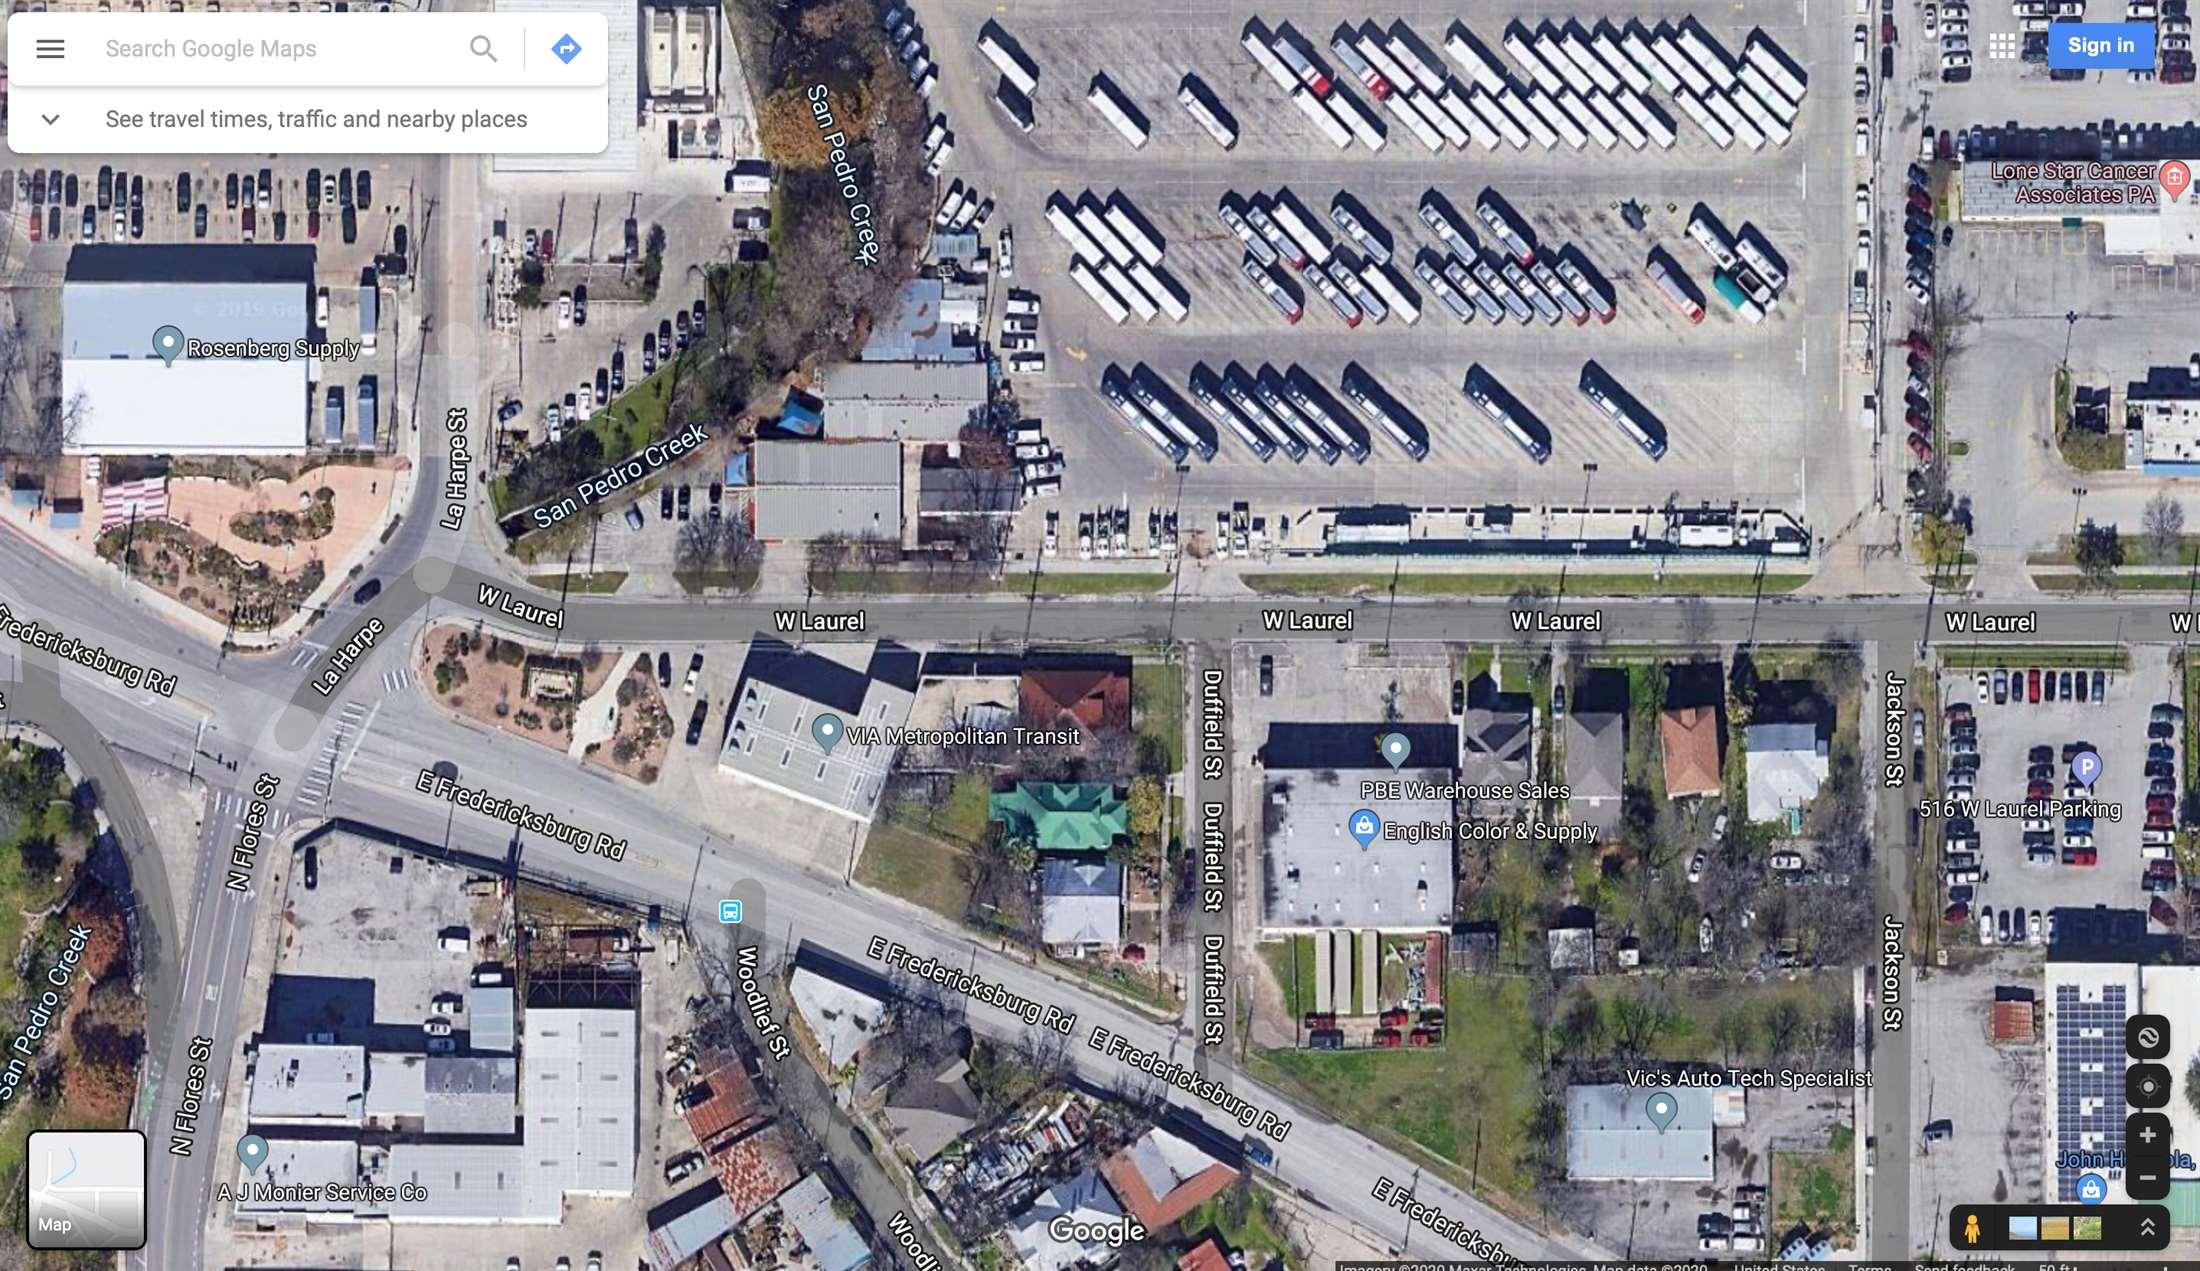 107 Duffield St, San Antonio, TX 78212